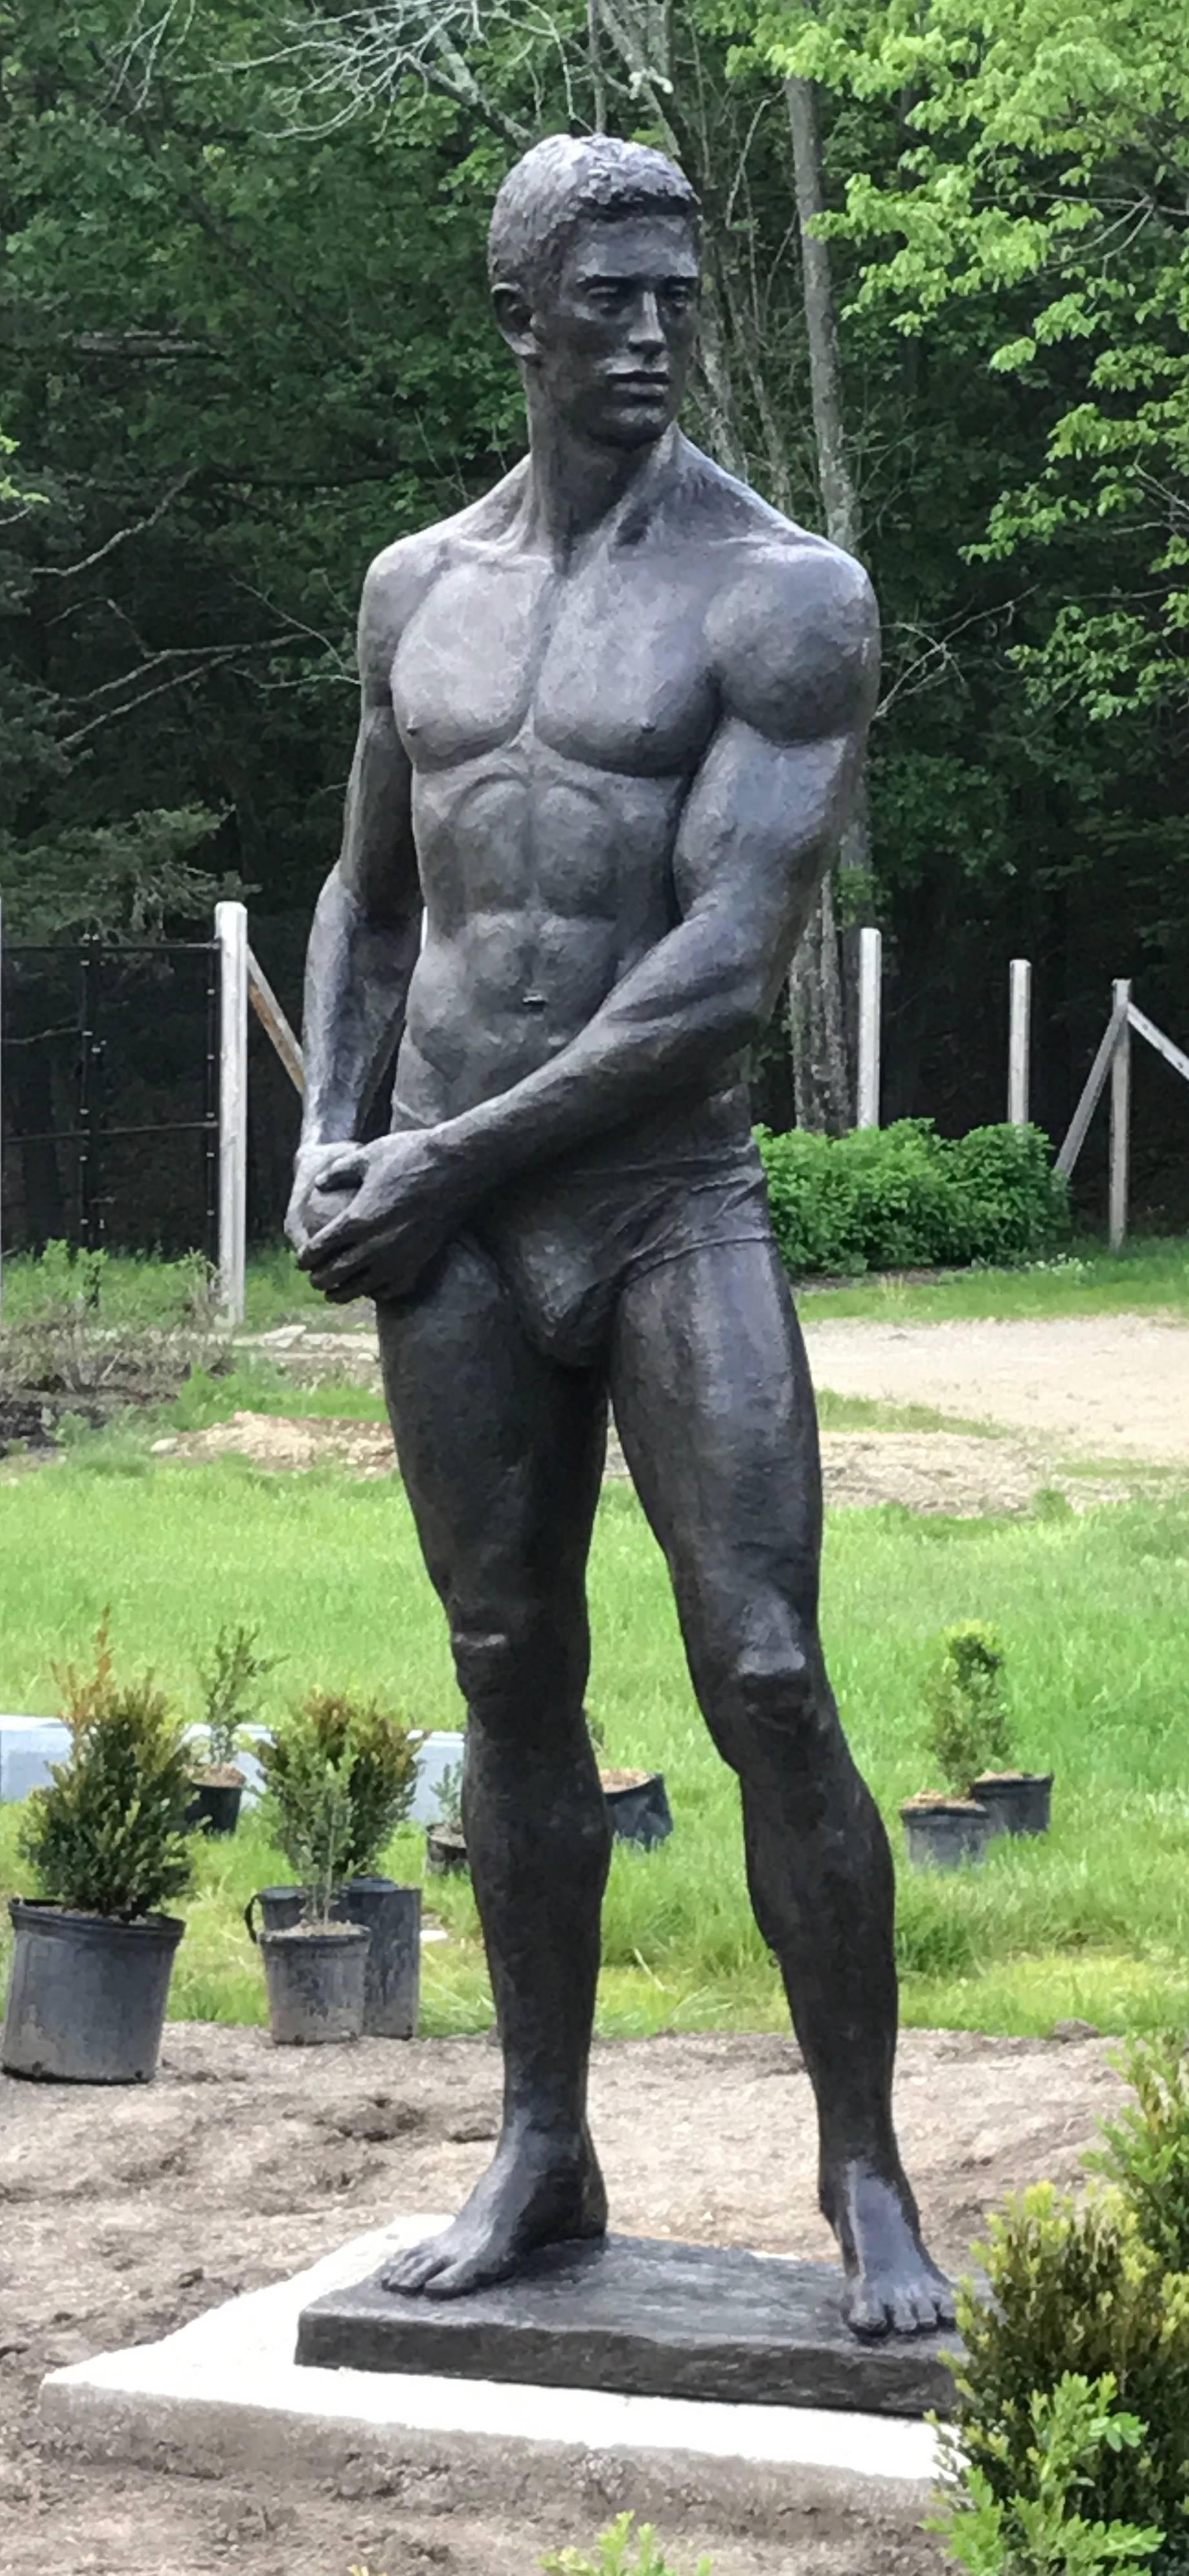 Geri halliwell nude Nude Photos